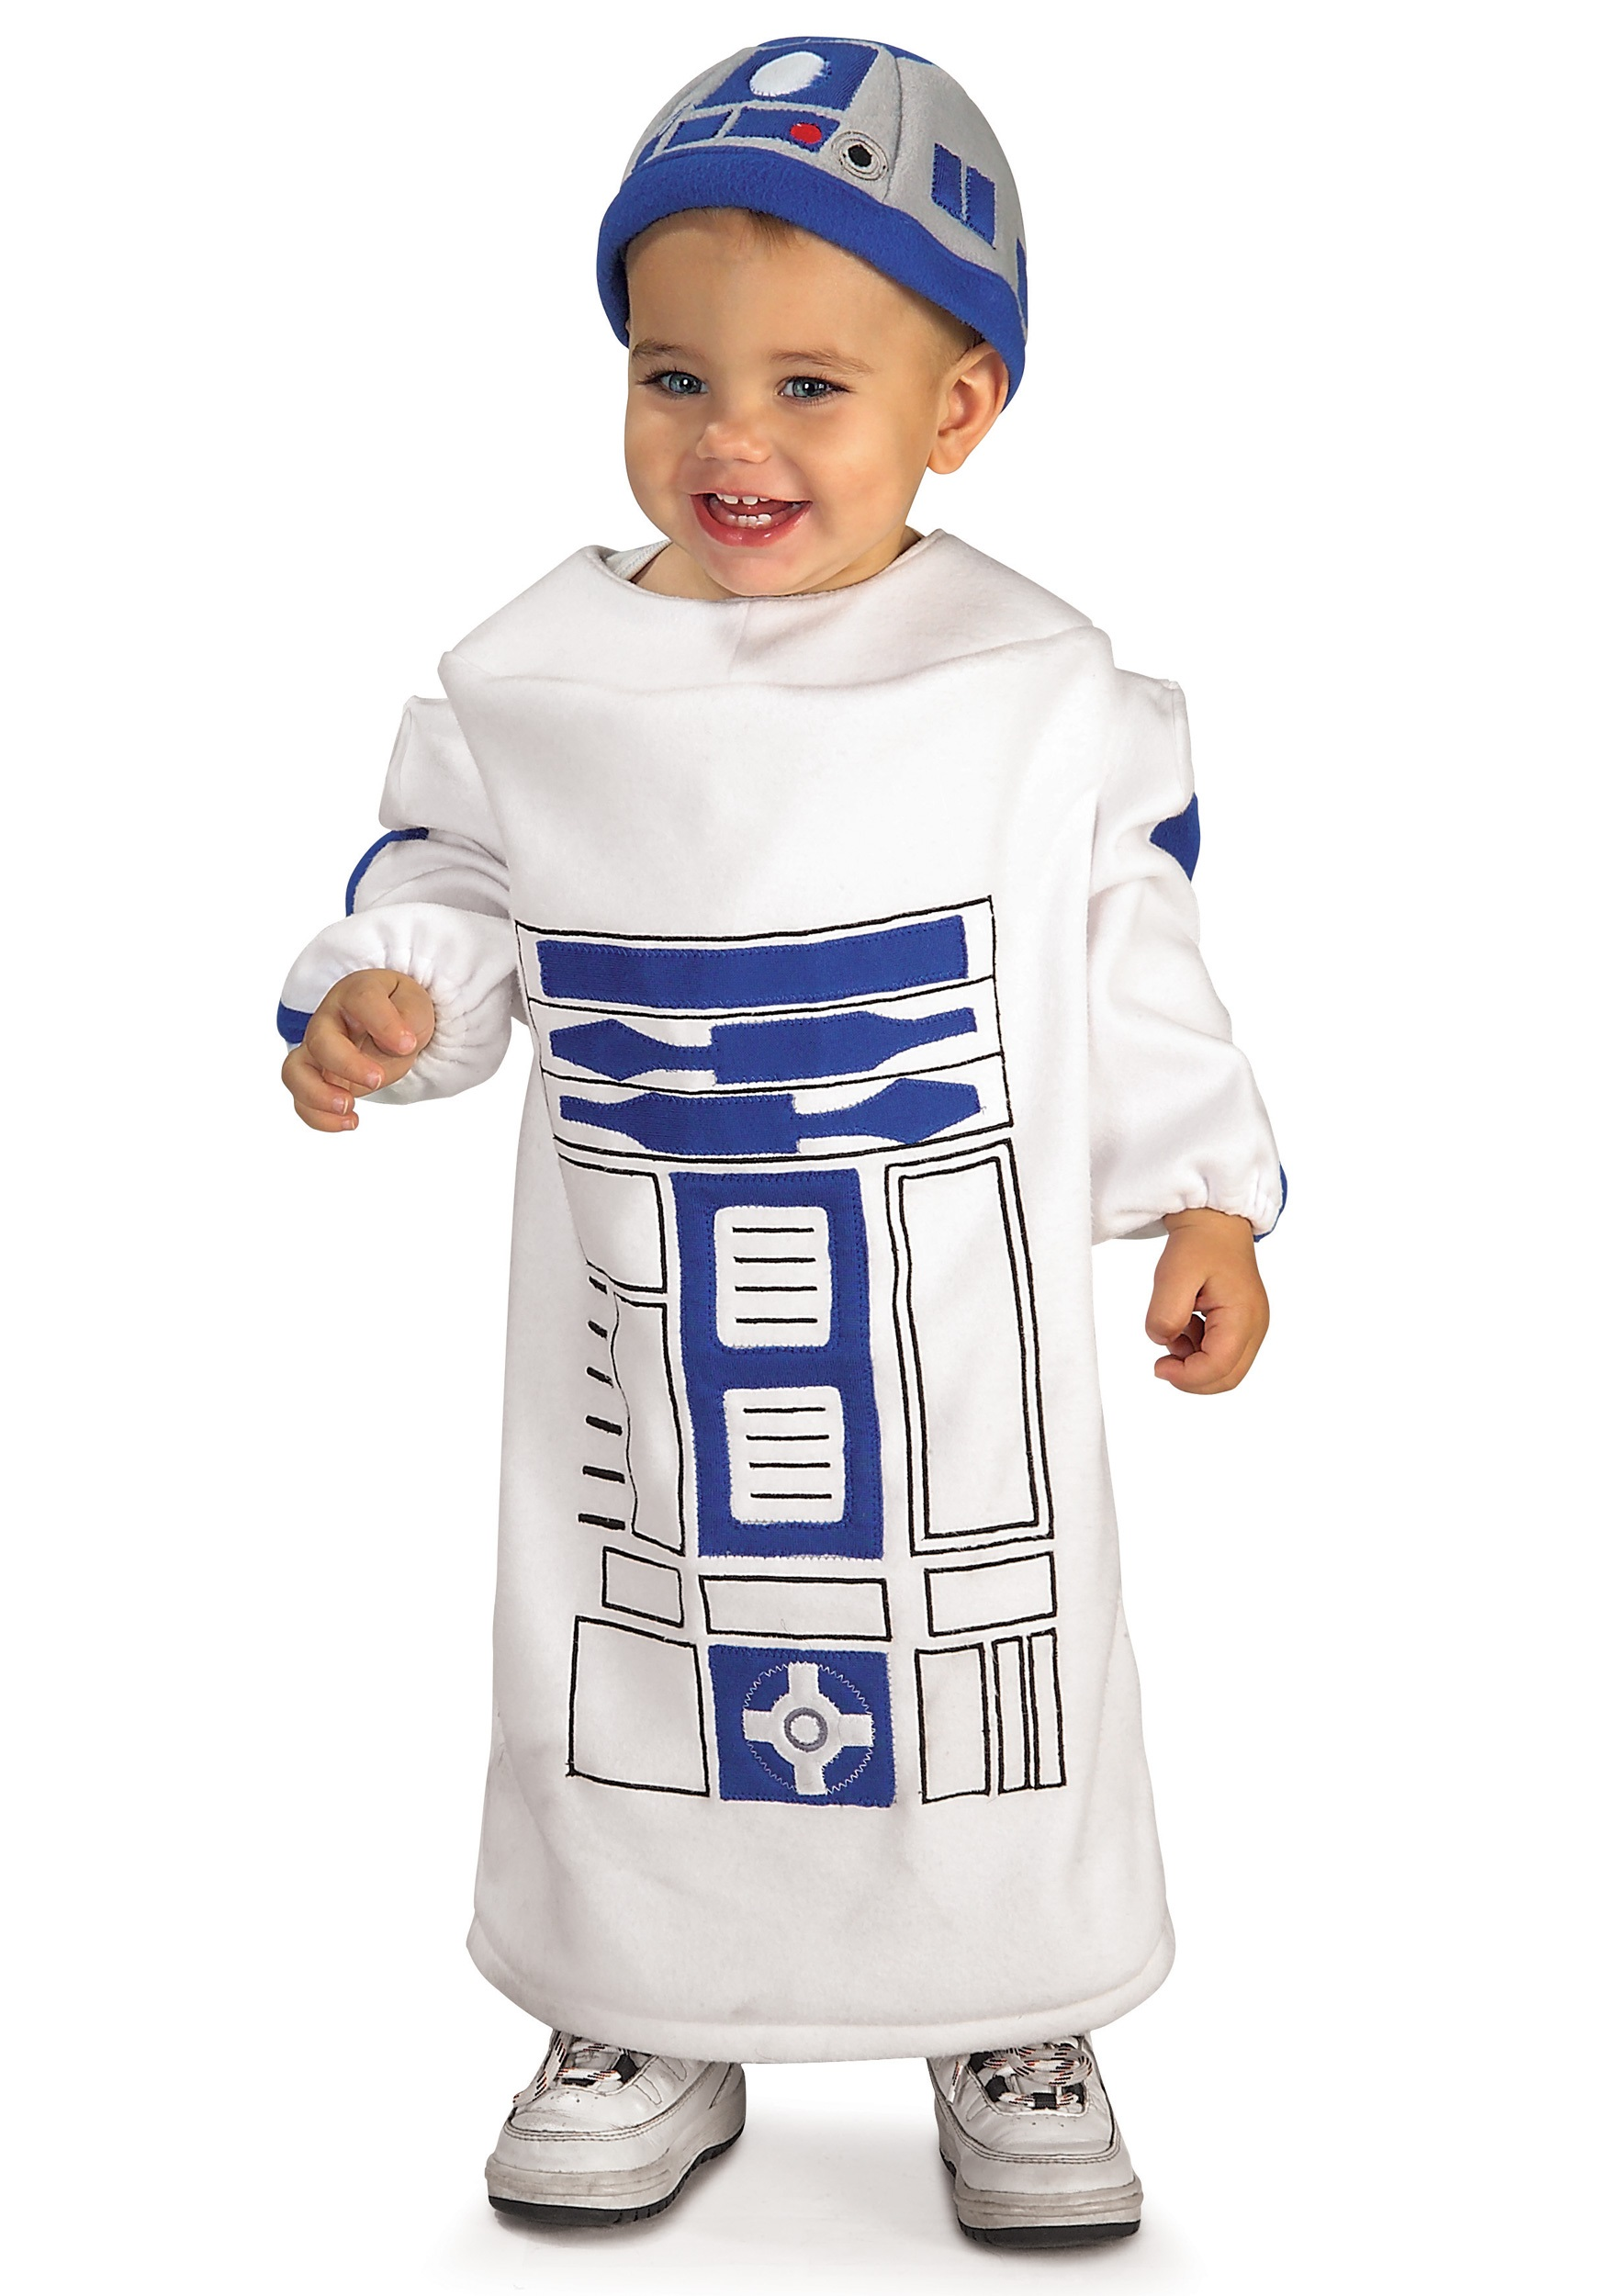 http://images.halloweencostumes.com/kids-r2d2-costume-zoom.jpg